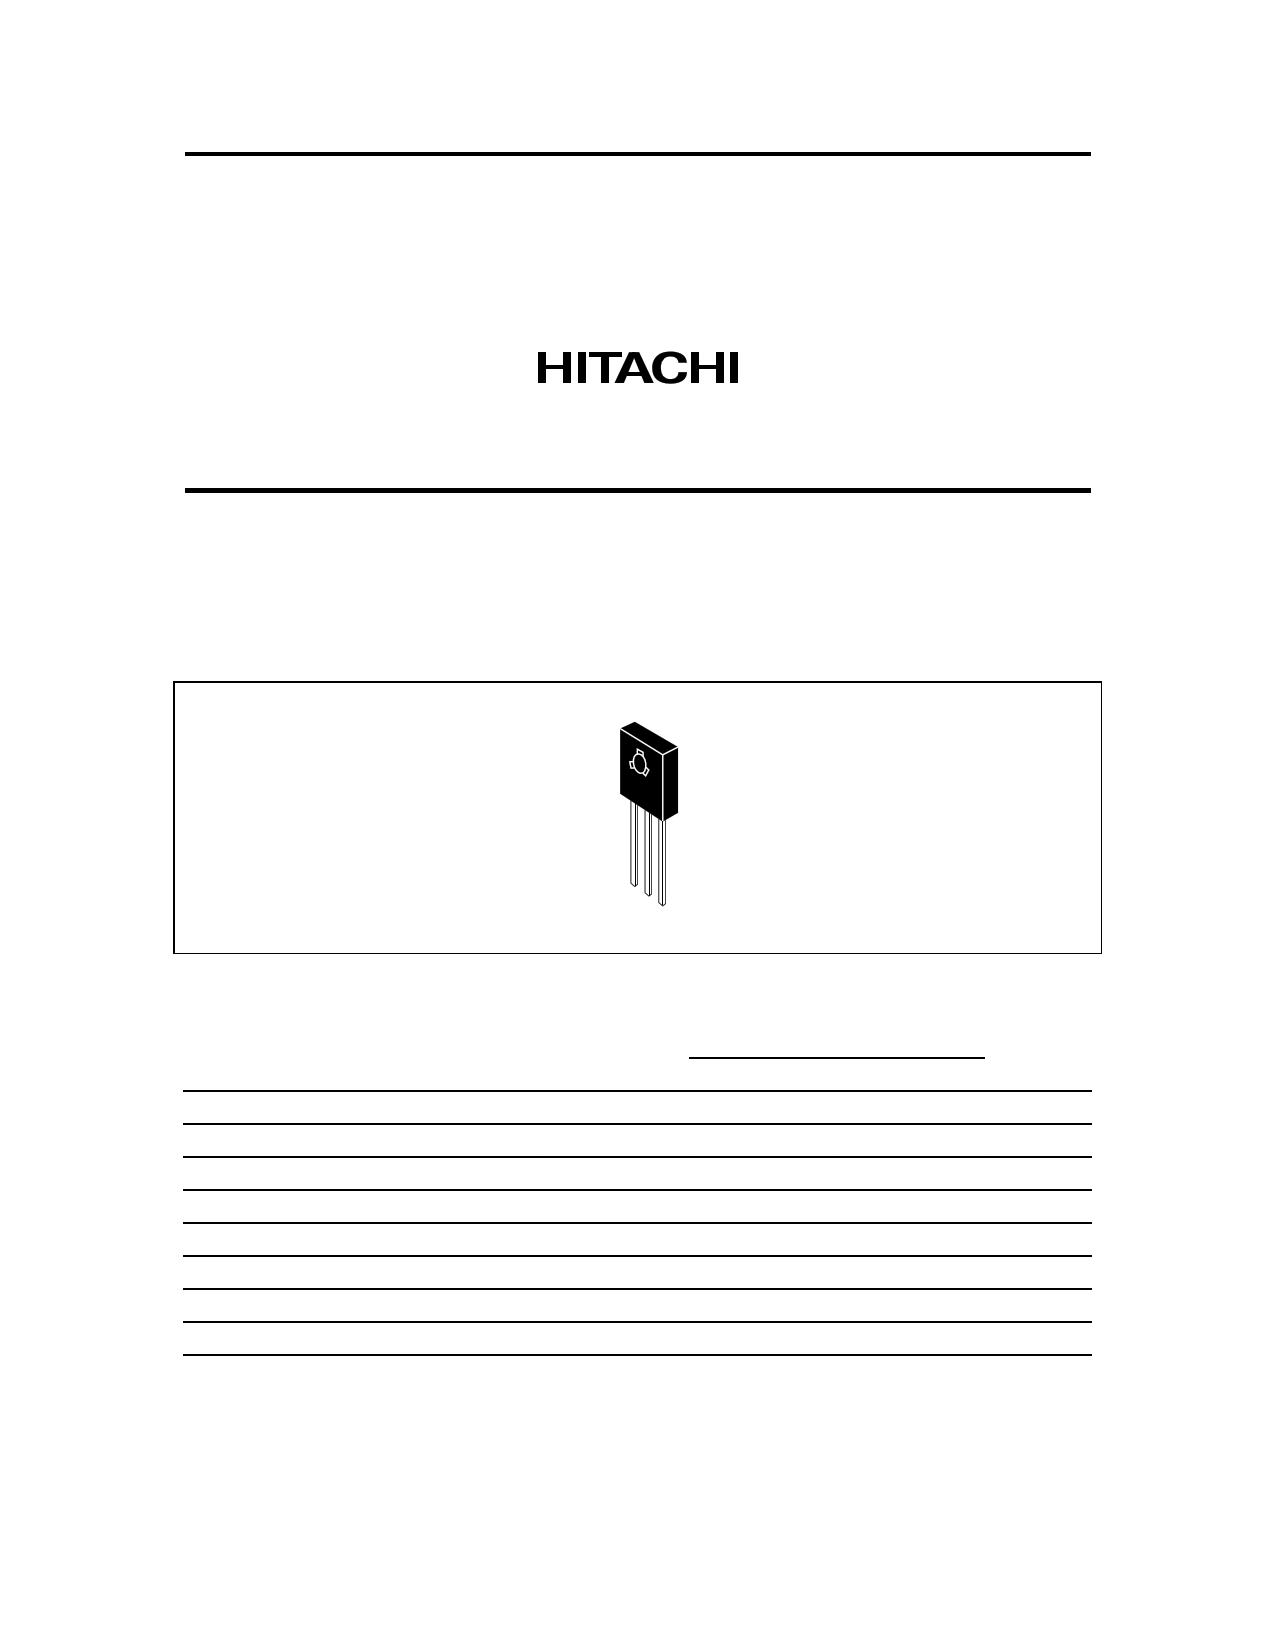 2SB648 datasheet, circuit